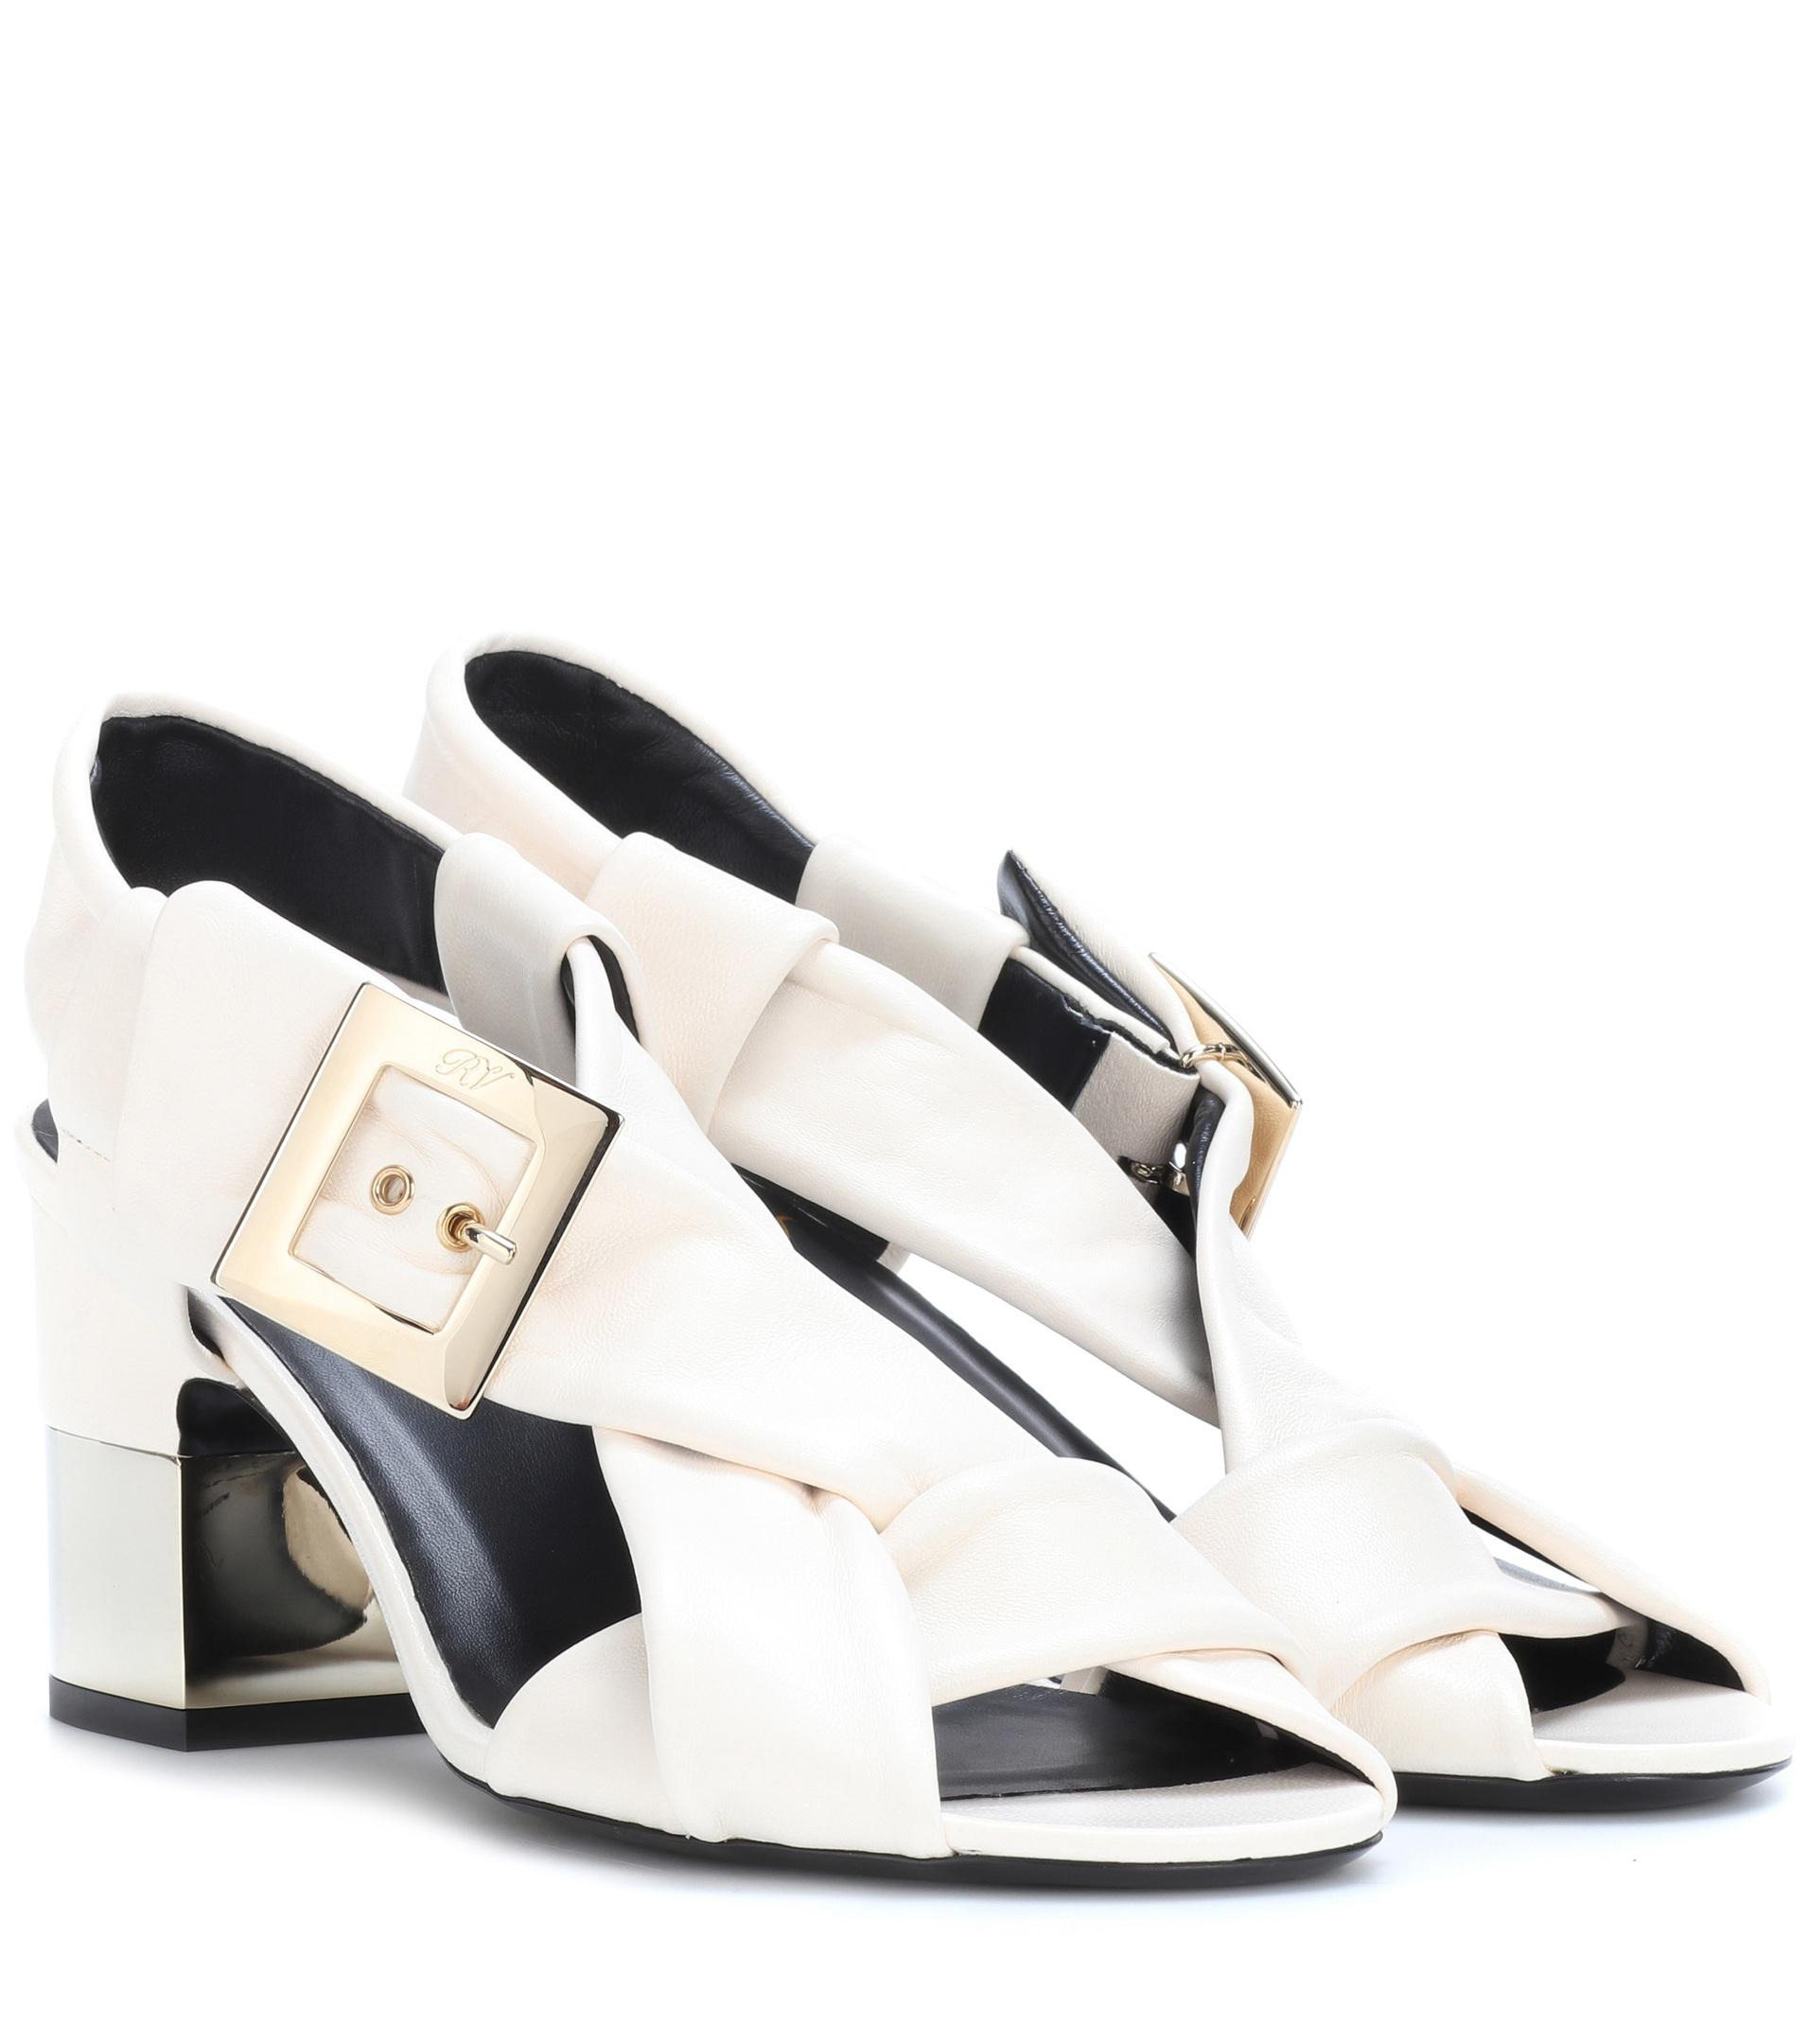 Roger Vivier Podium leather sandals PdBXxhymxh